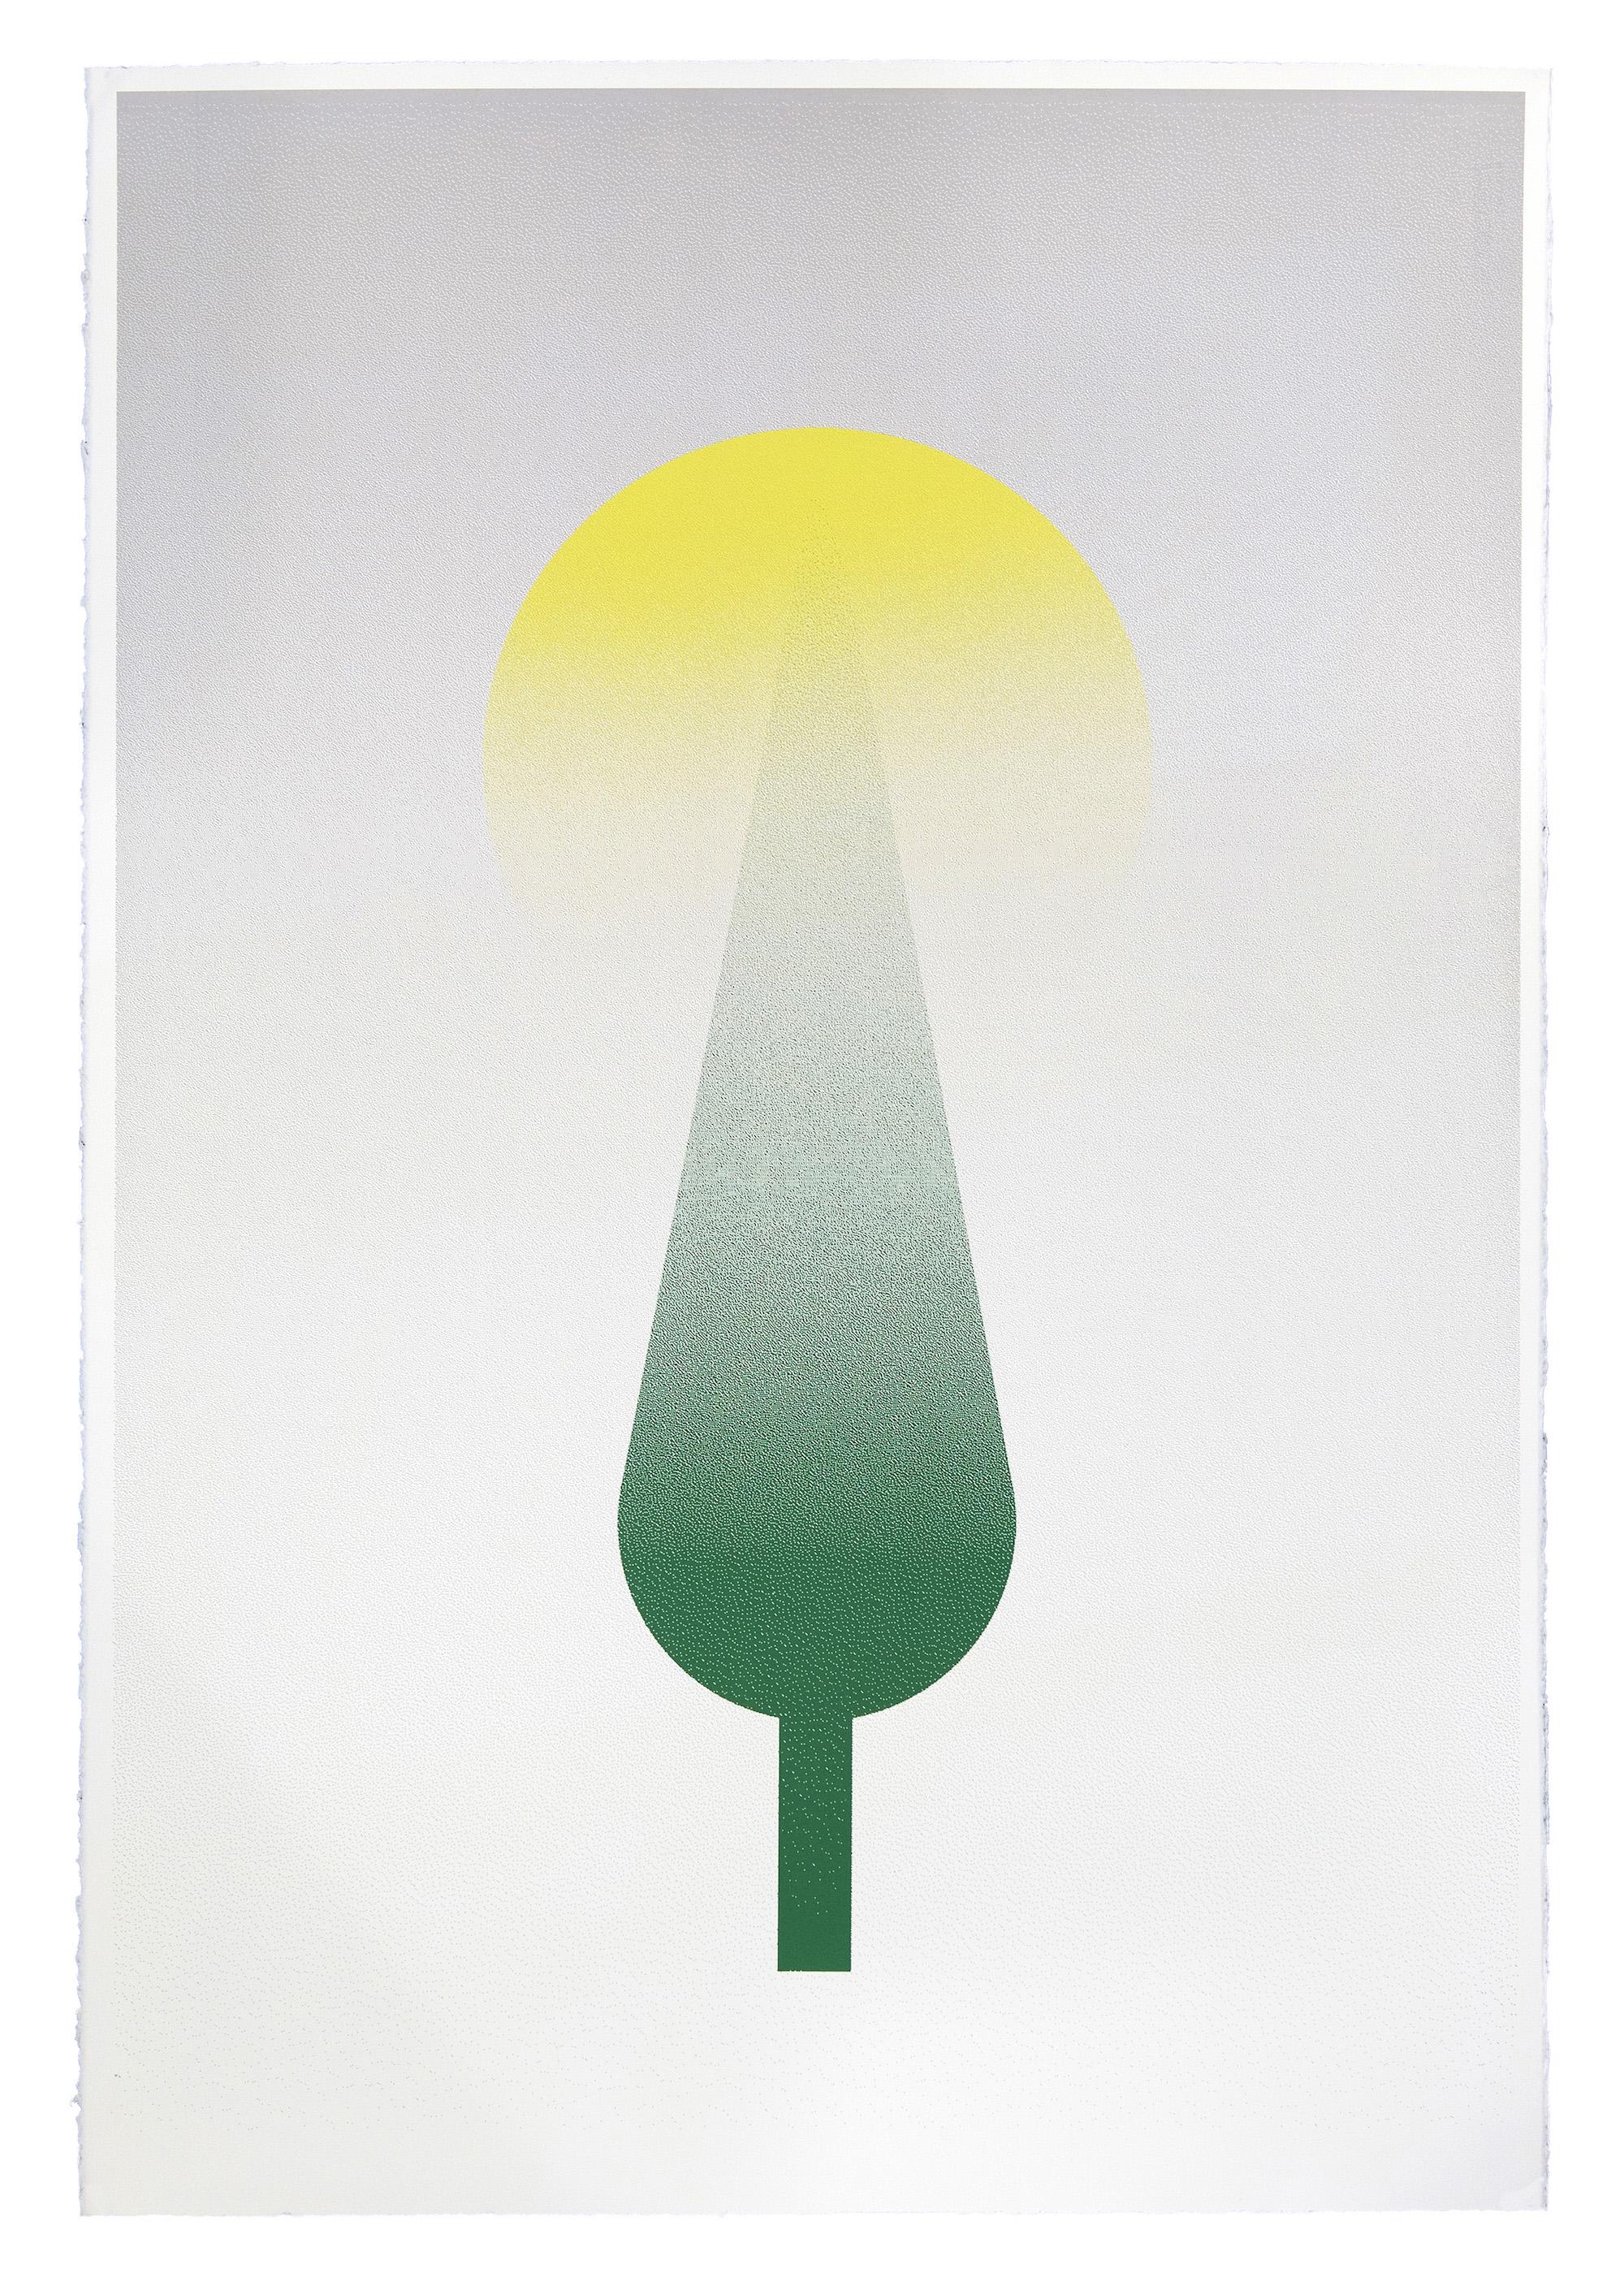 Fahd Burki   Toward Light 2013 Screen print on paper 112.5 x 76.5 cm